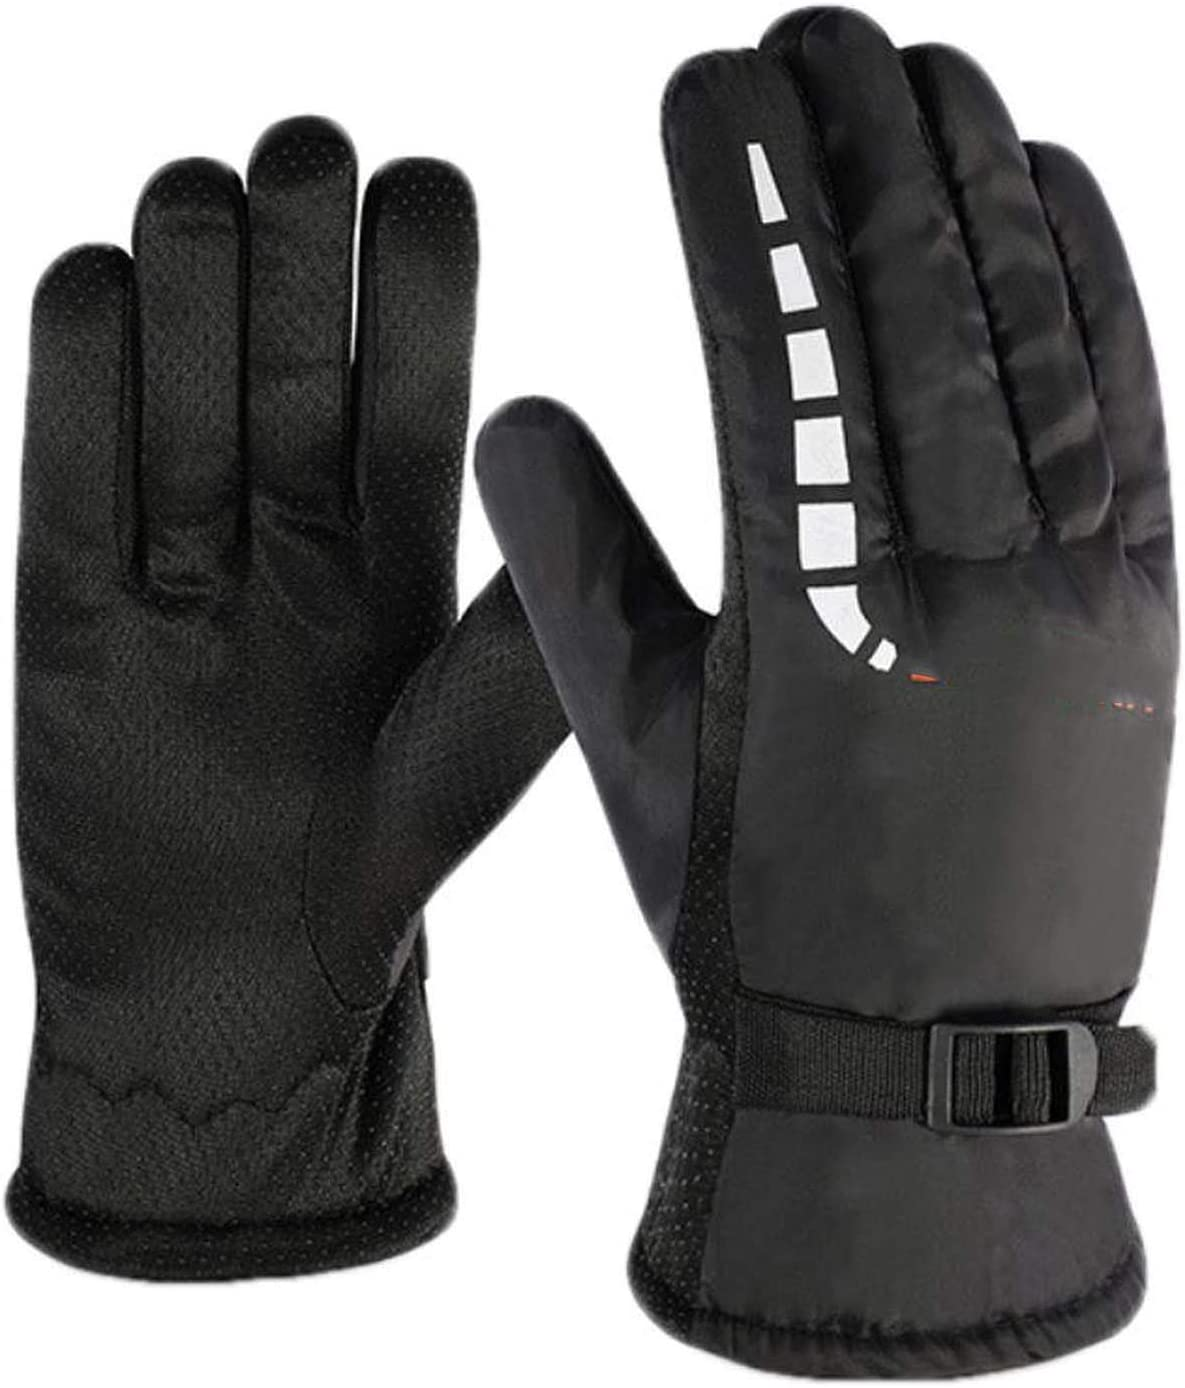 YR5V4V Ski Gloves Waterproof Windproof Warm Non Slip Outdoor Riding Motorcycle Gloves Wear Velvet Thickening Skiing Gloves,B,China